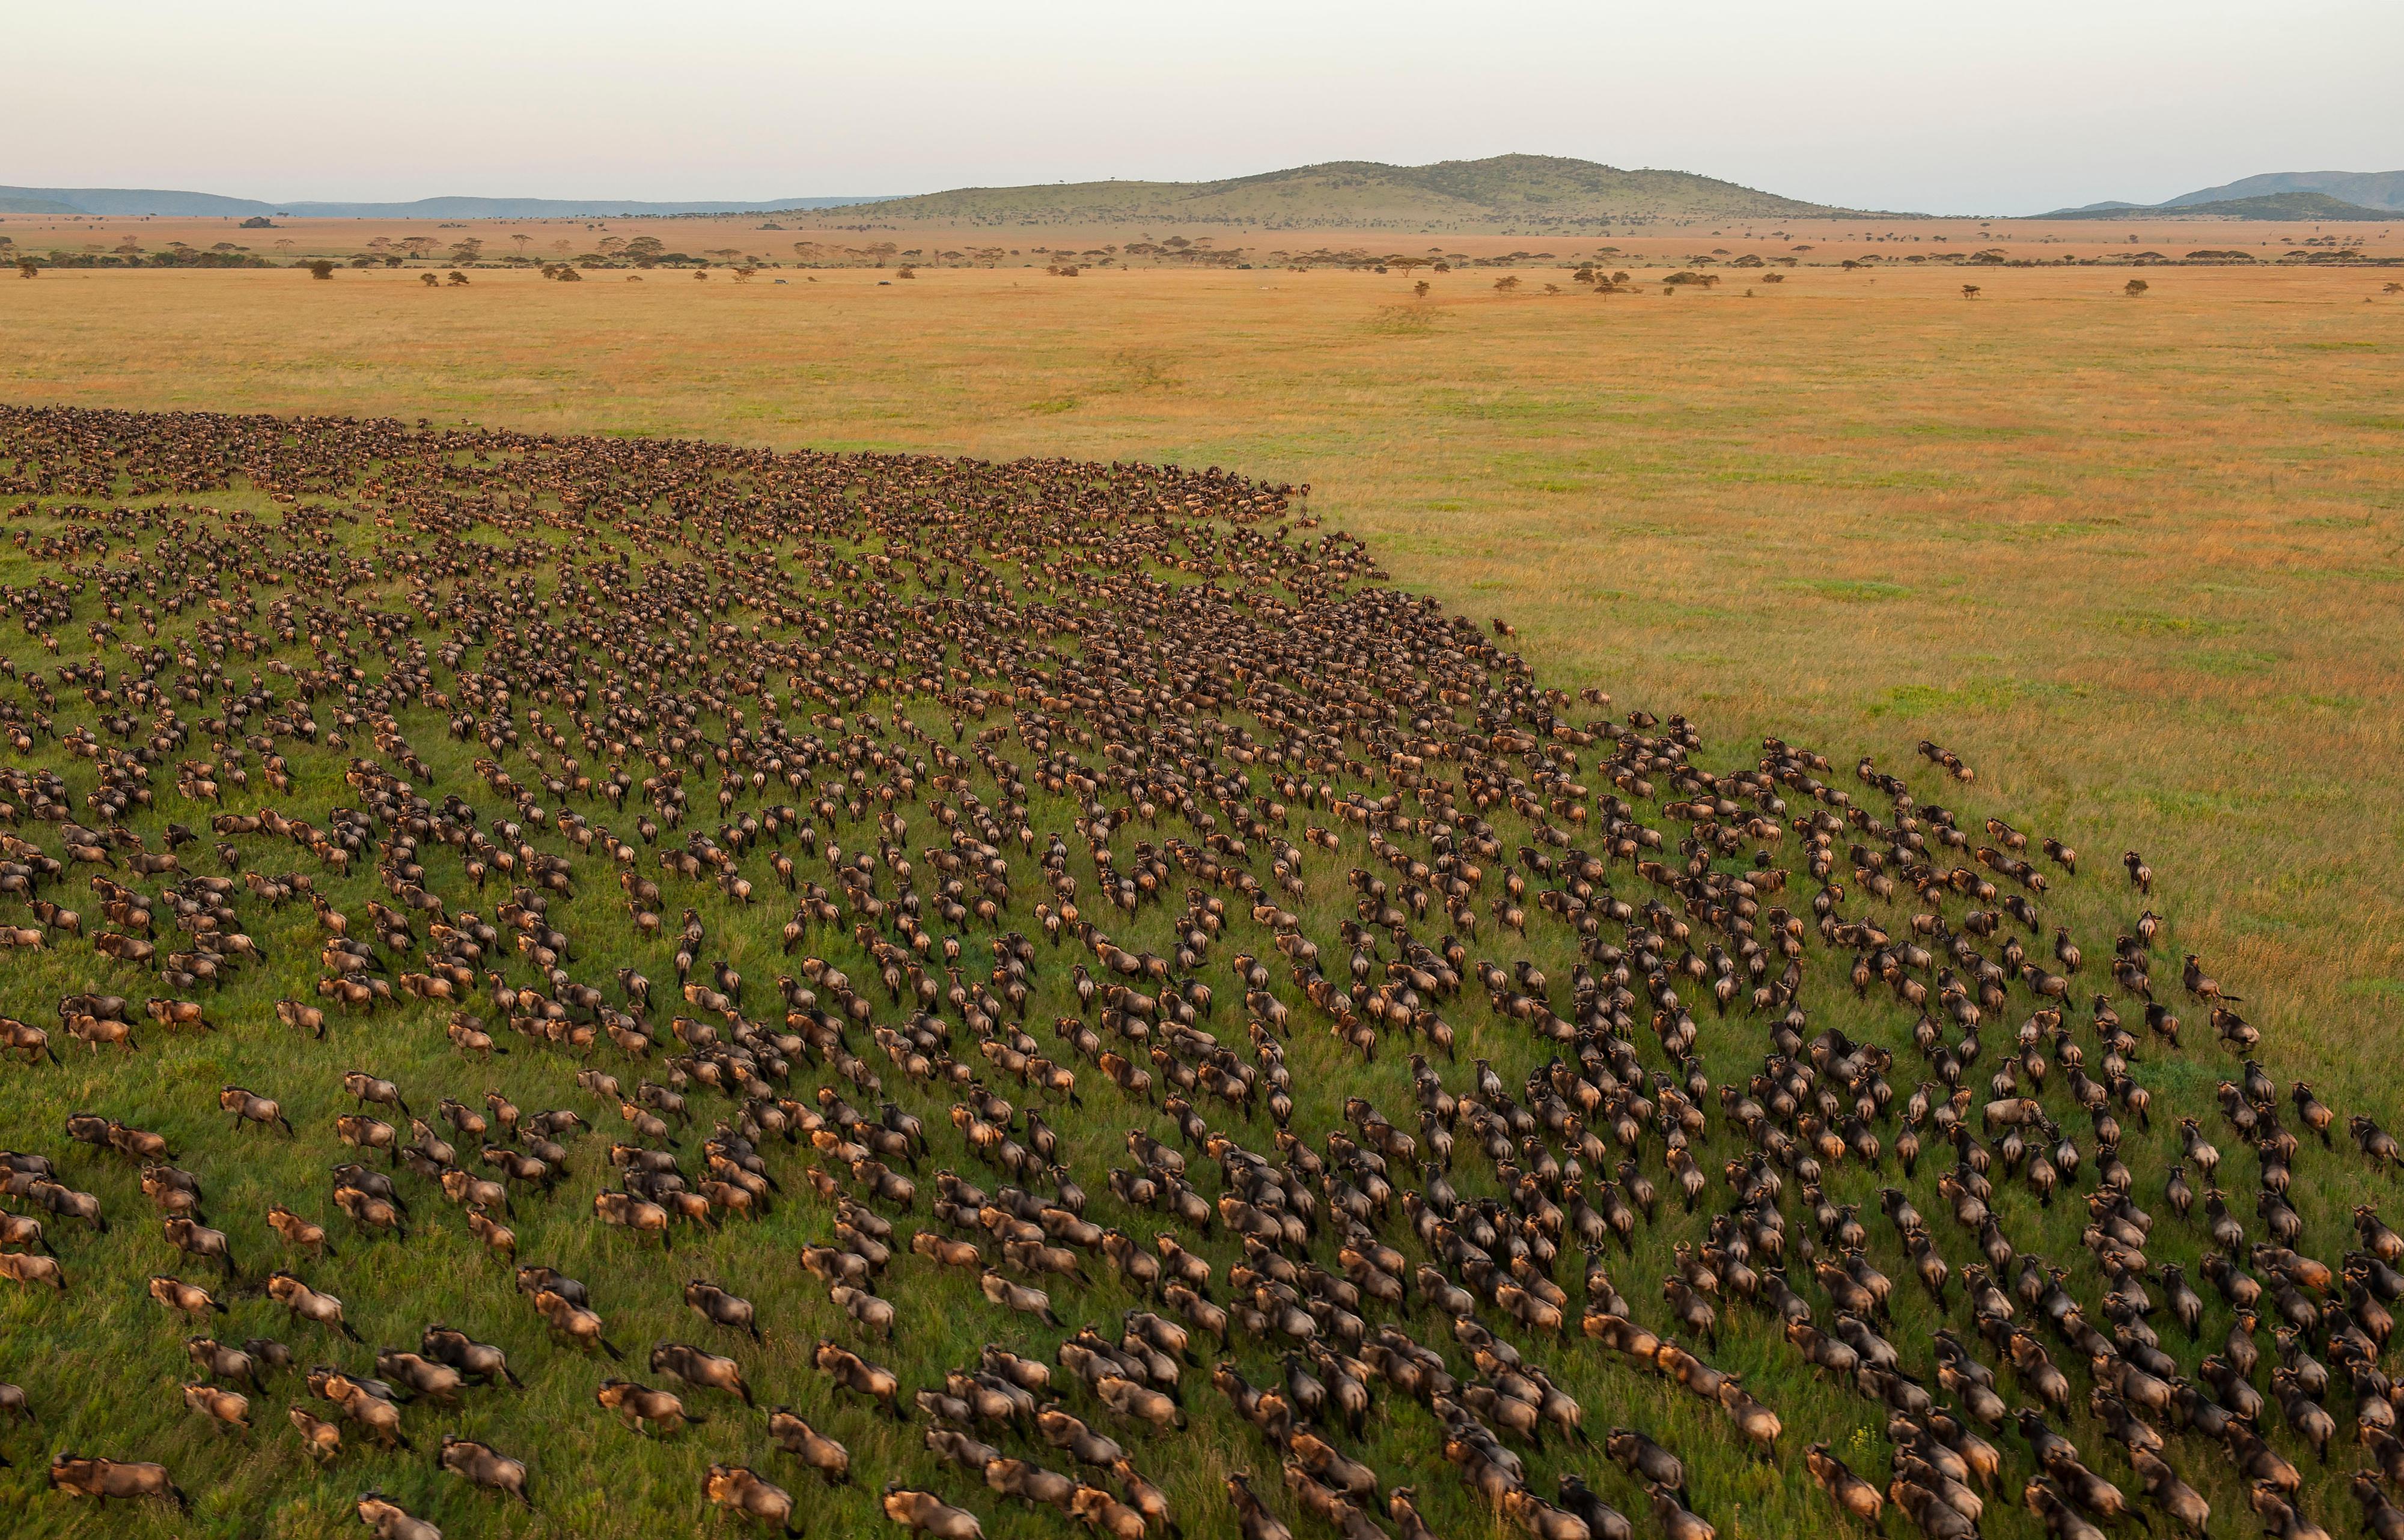 Gnus im Serengeti-Nationalpark in Tansania